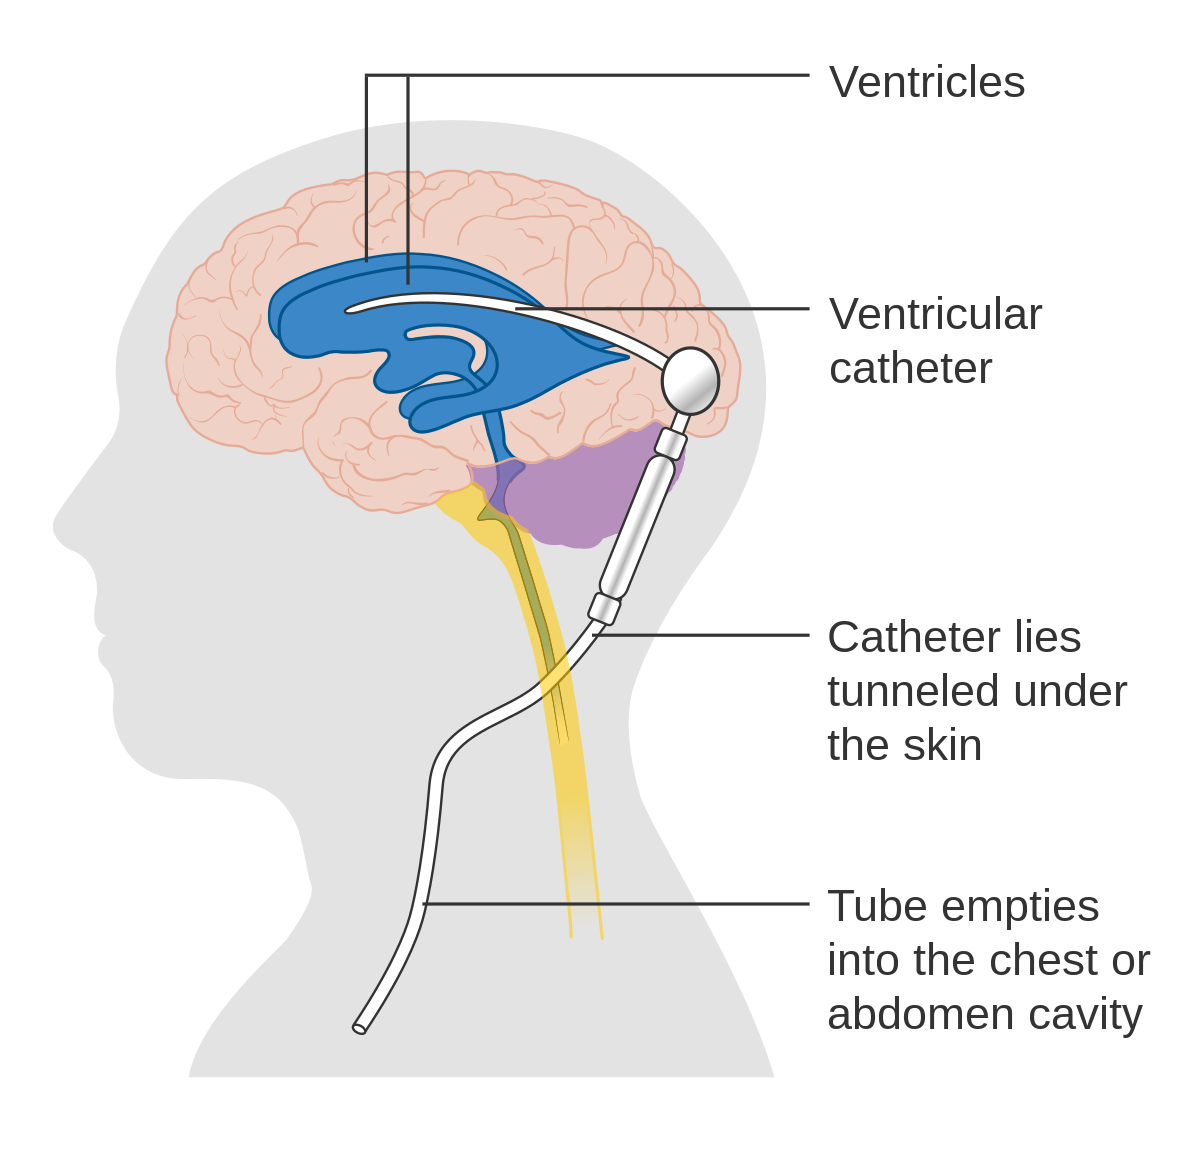 Shunt revision symptoms adults